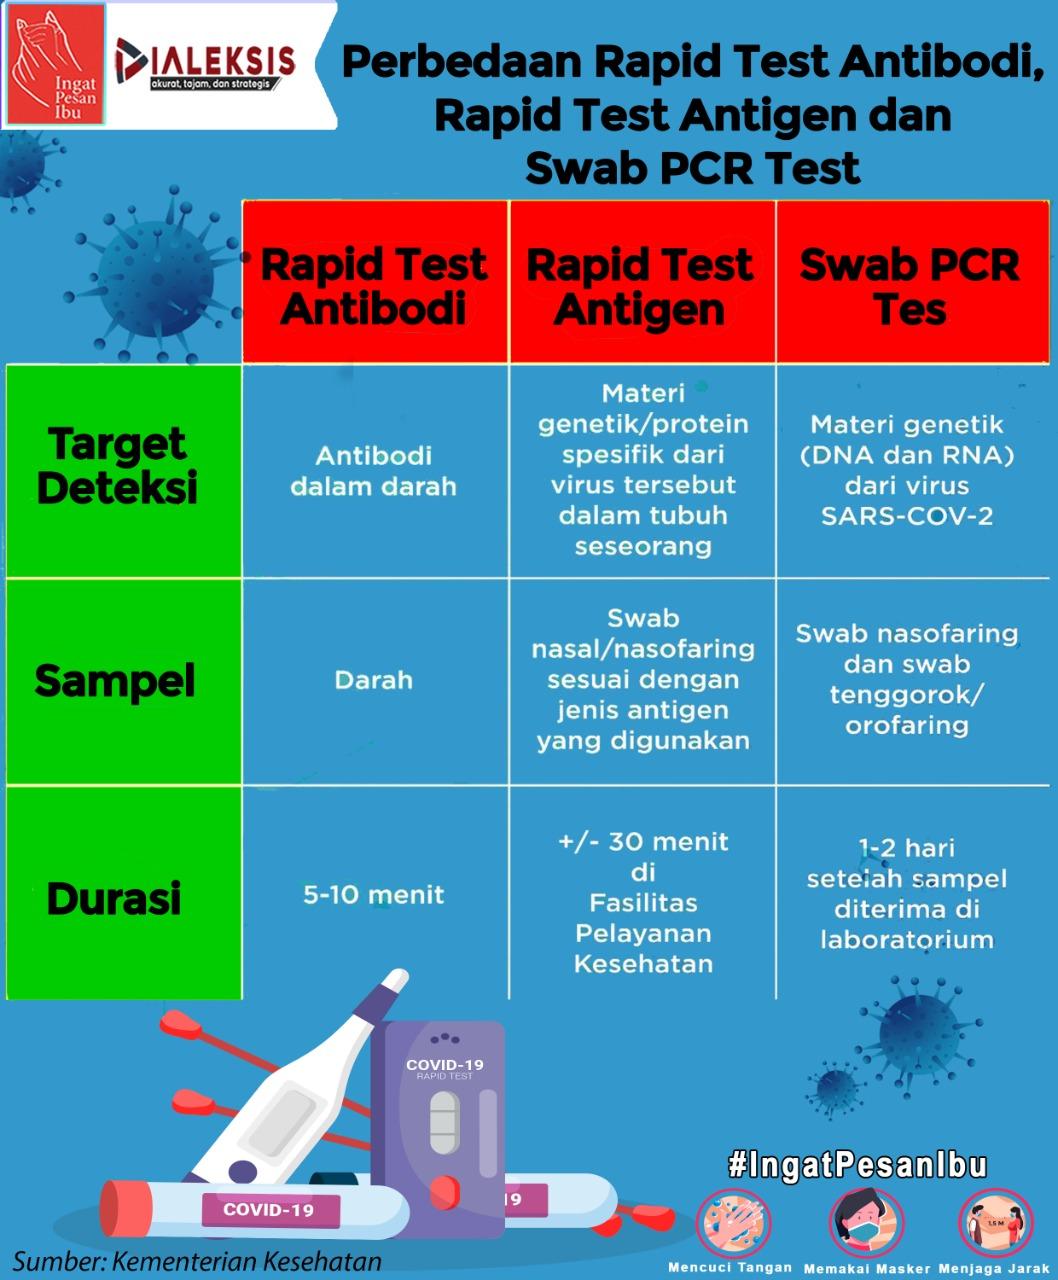 Perbedaan Rapid Test AntiBodi, Rapid Test Antigen dan Swab PCR